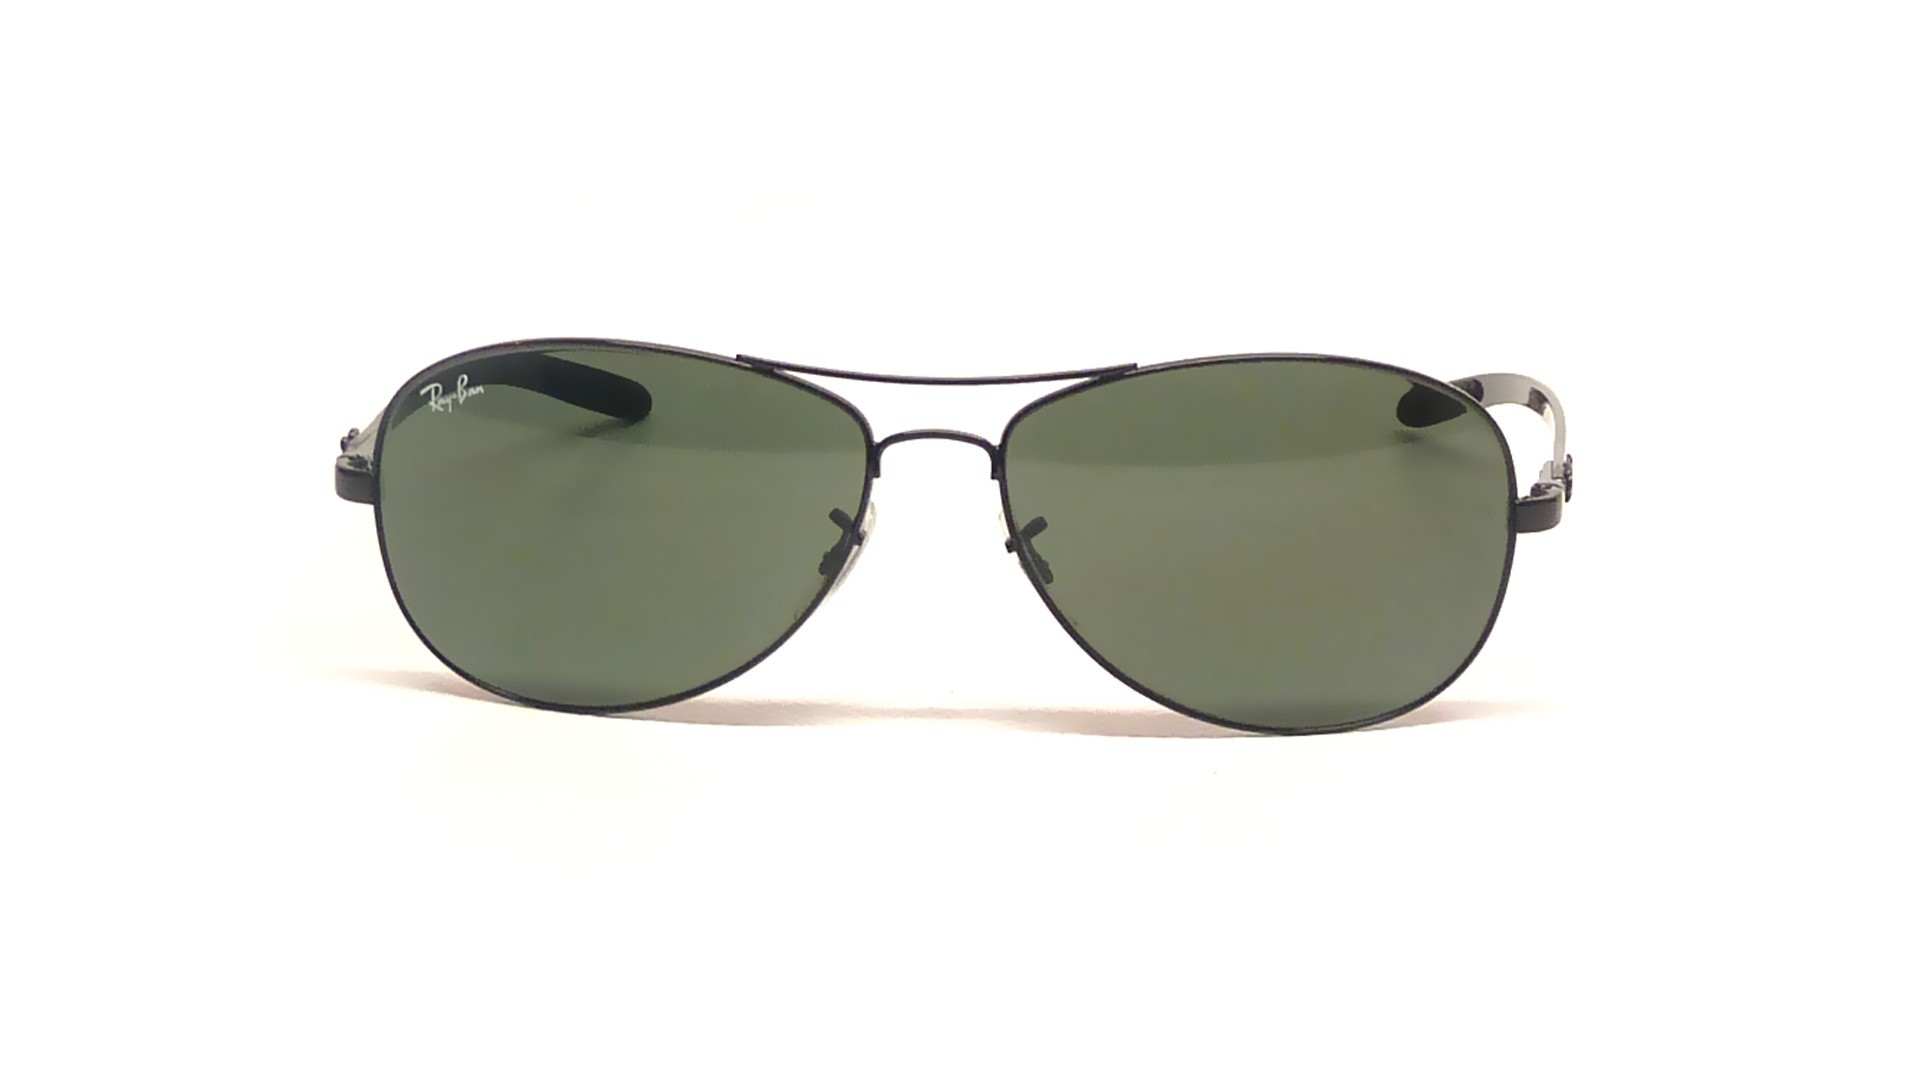 255ce23b5d2 Ray Ban Rb8301 Carbon Fiber 002 Black Cockpit Sunglasses « Heritage ...